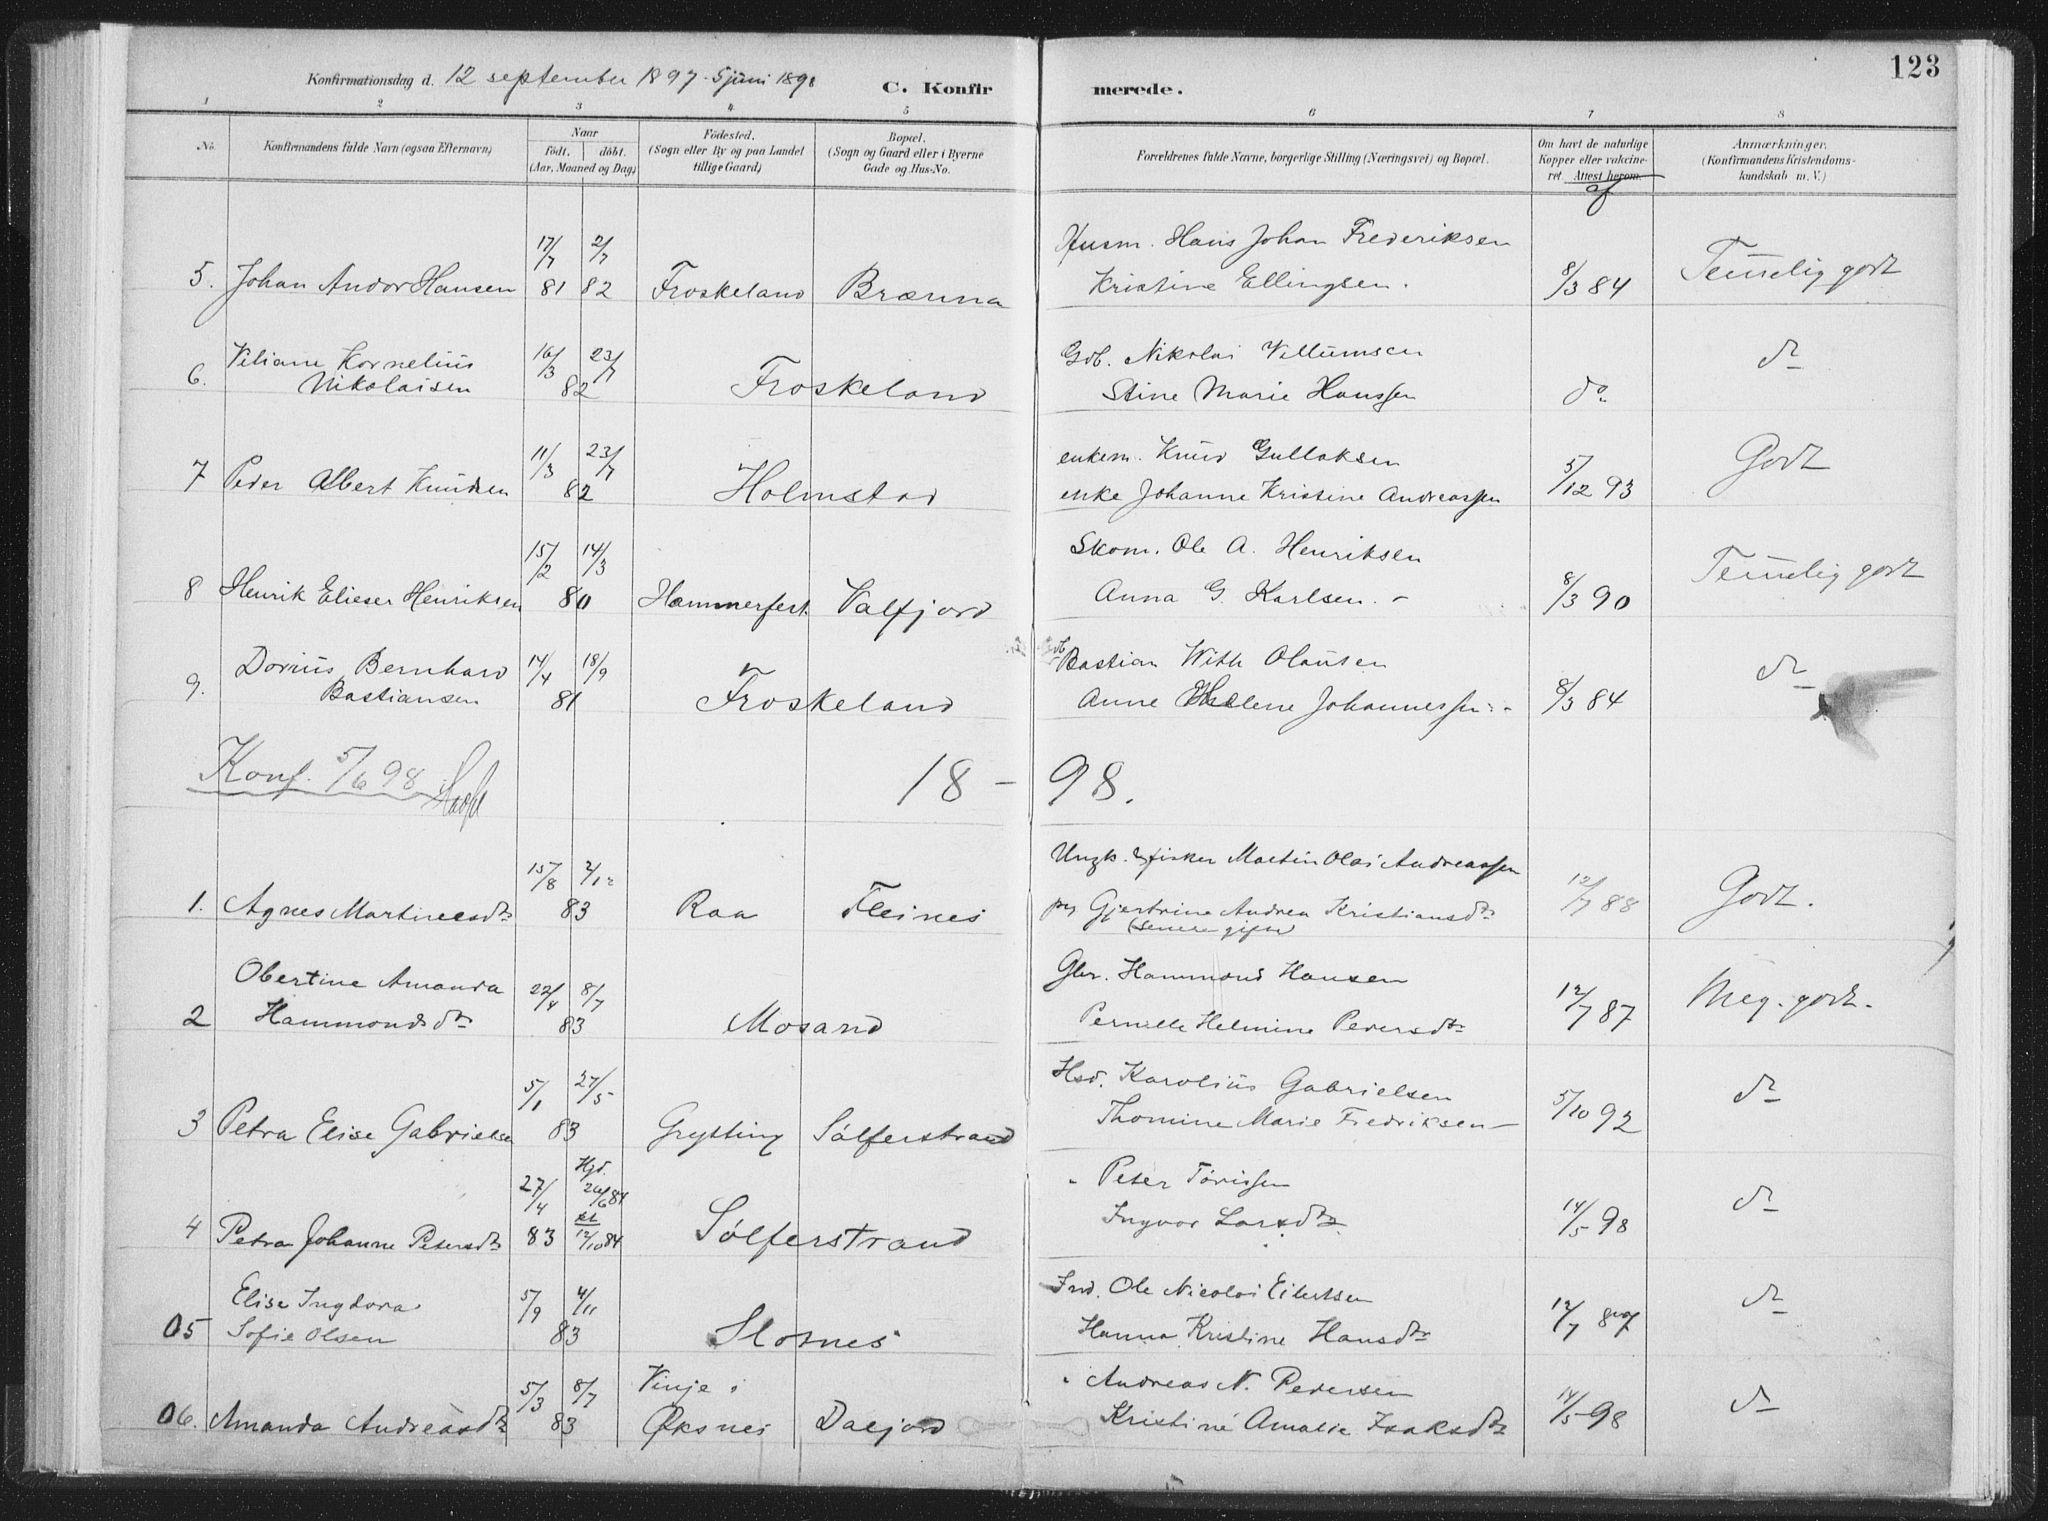 SAT, Ministerialprotokoller, klokkerbøker og fødselsregistre - Nordland, 890/L1286: Ministerialbok nr. 890A01, 1882-1902, s. 123